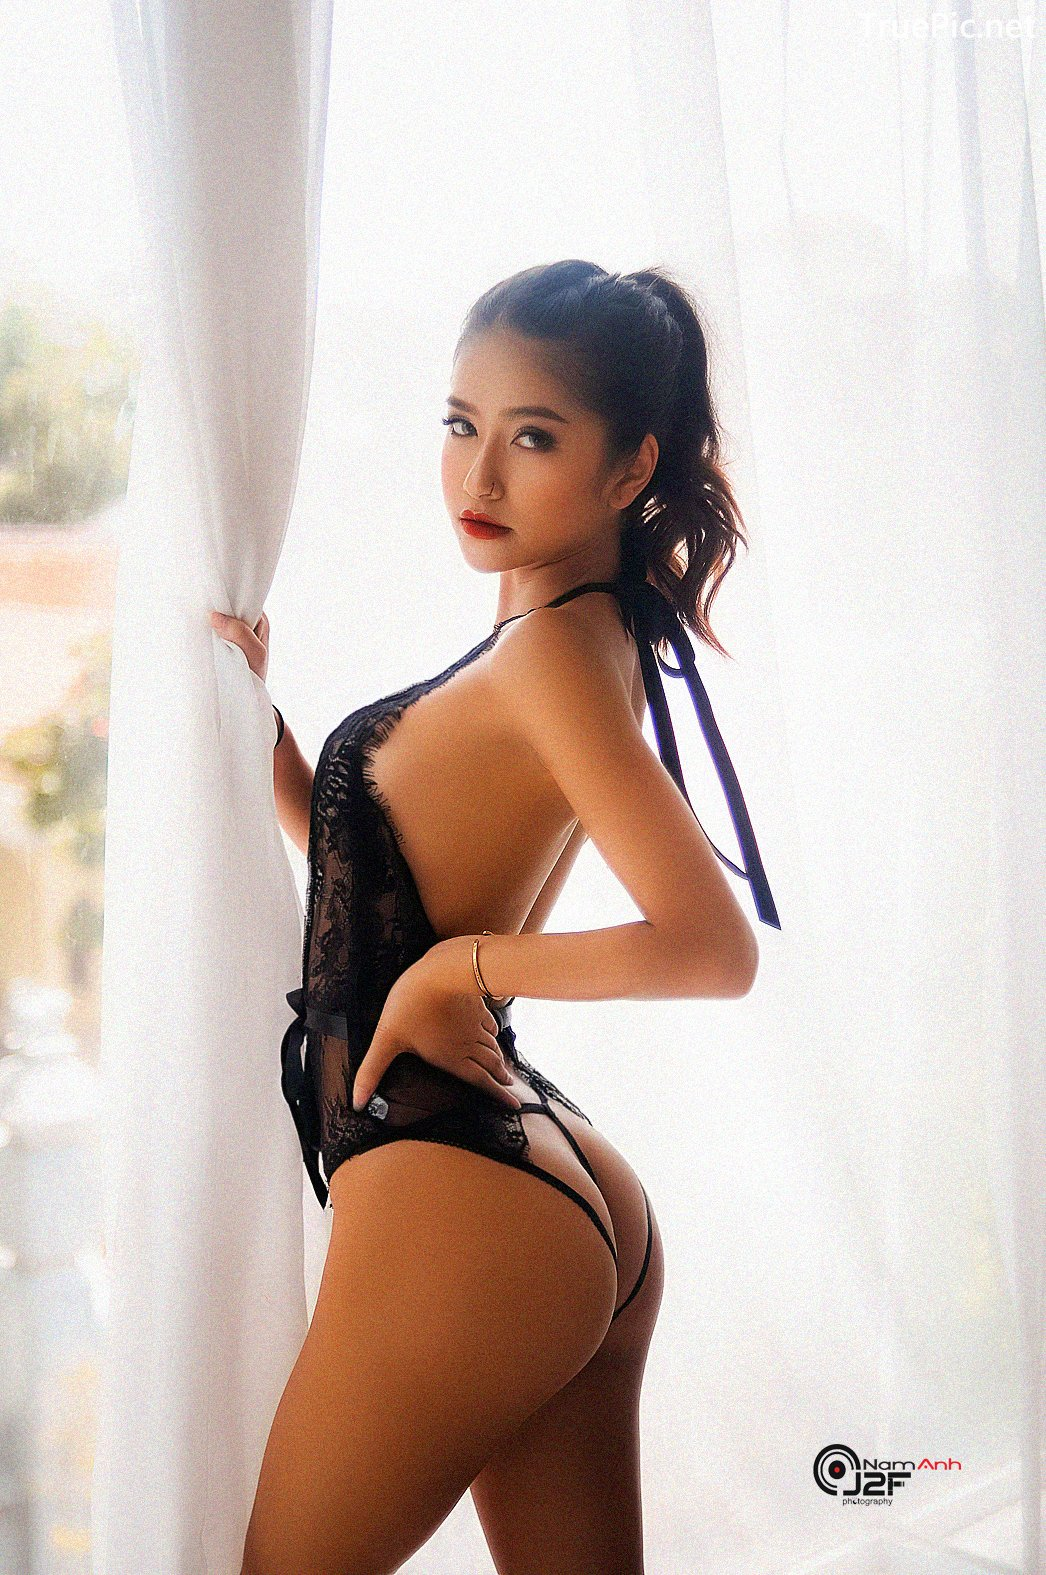 Image Vietnamese Model – Sexy Beauty of Beautiful Girls Taken by NamAnh Photo #7 - TruePic.net - Picture-33